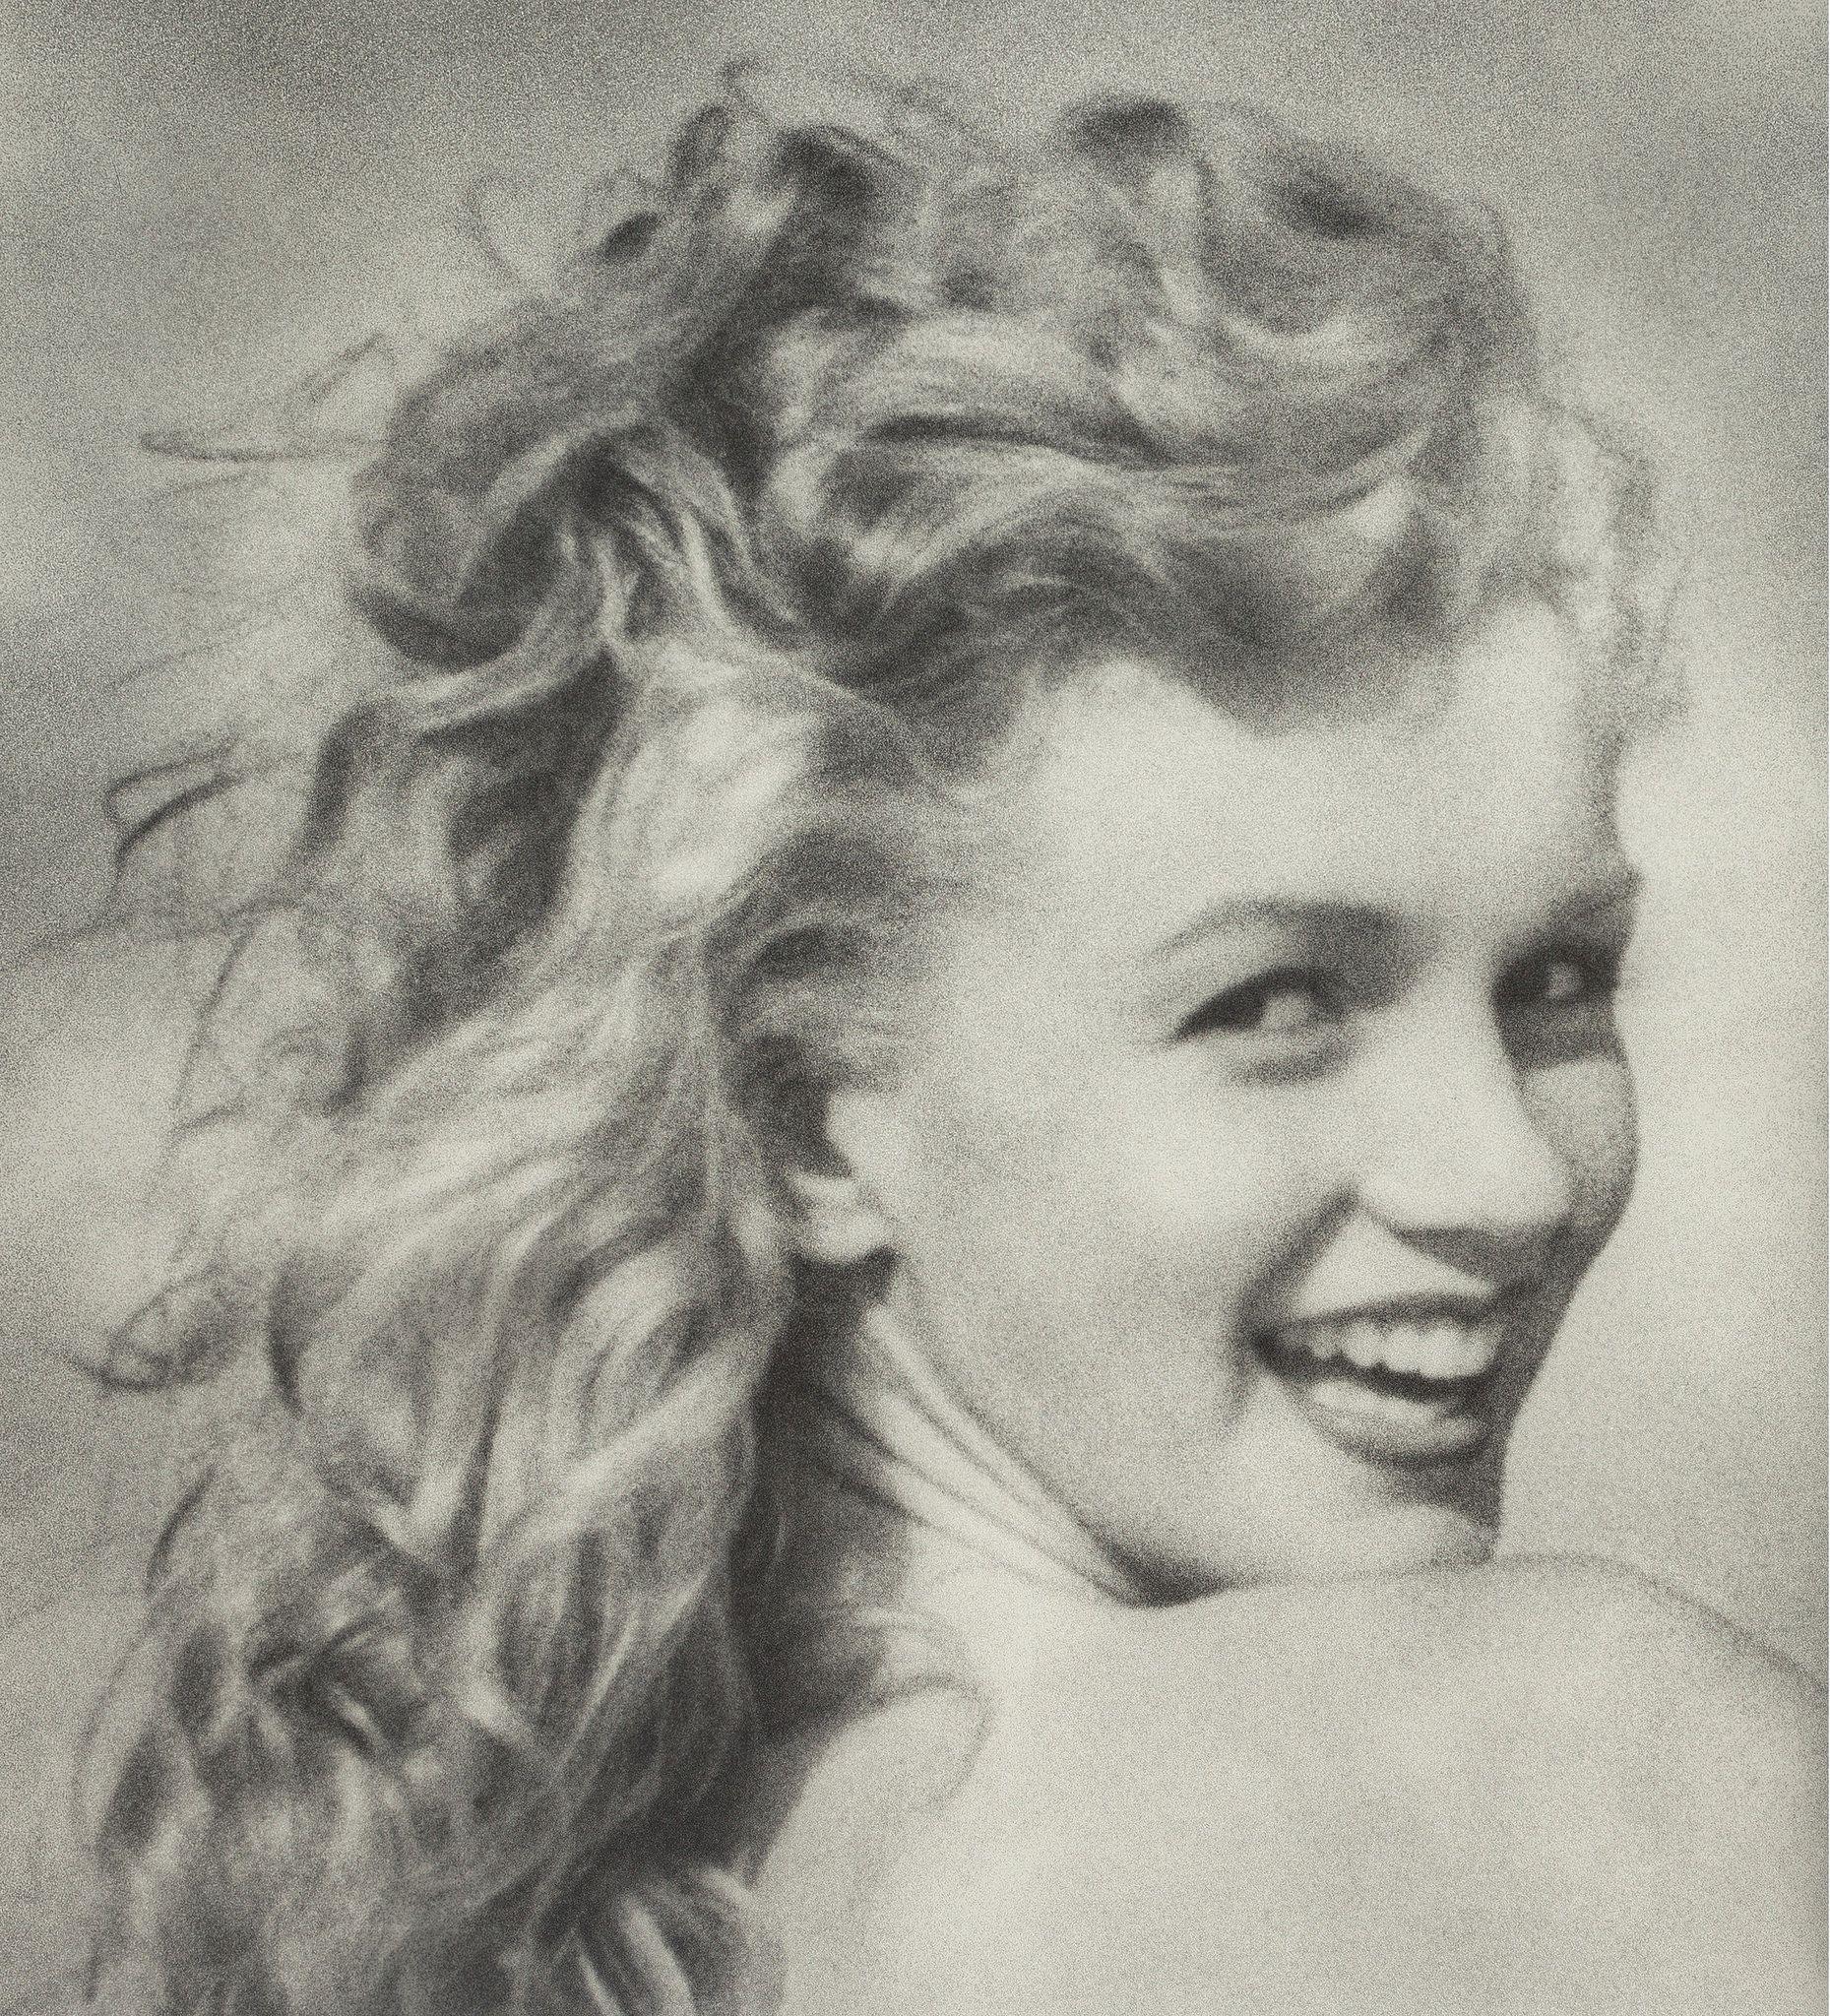 ANDRE DE DIENES (American, 19131985) Marilyn Monroe